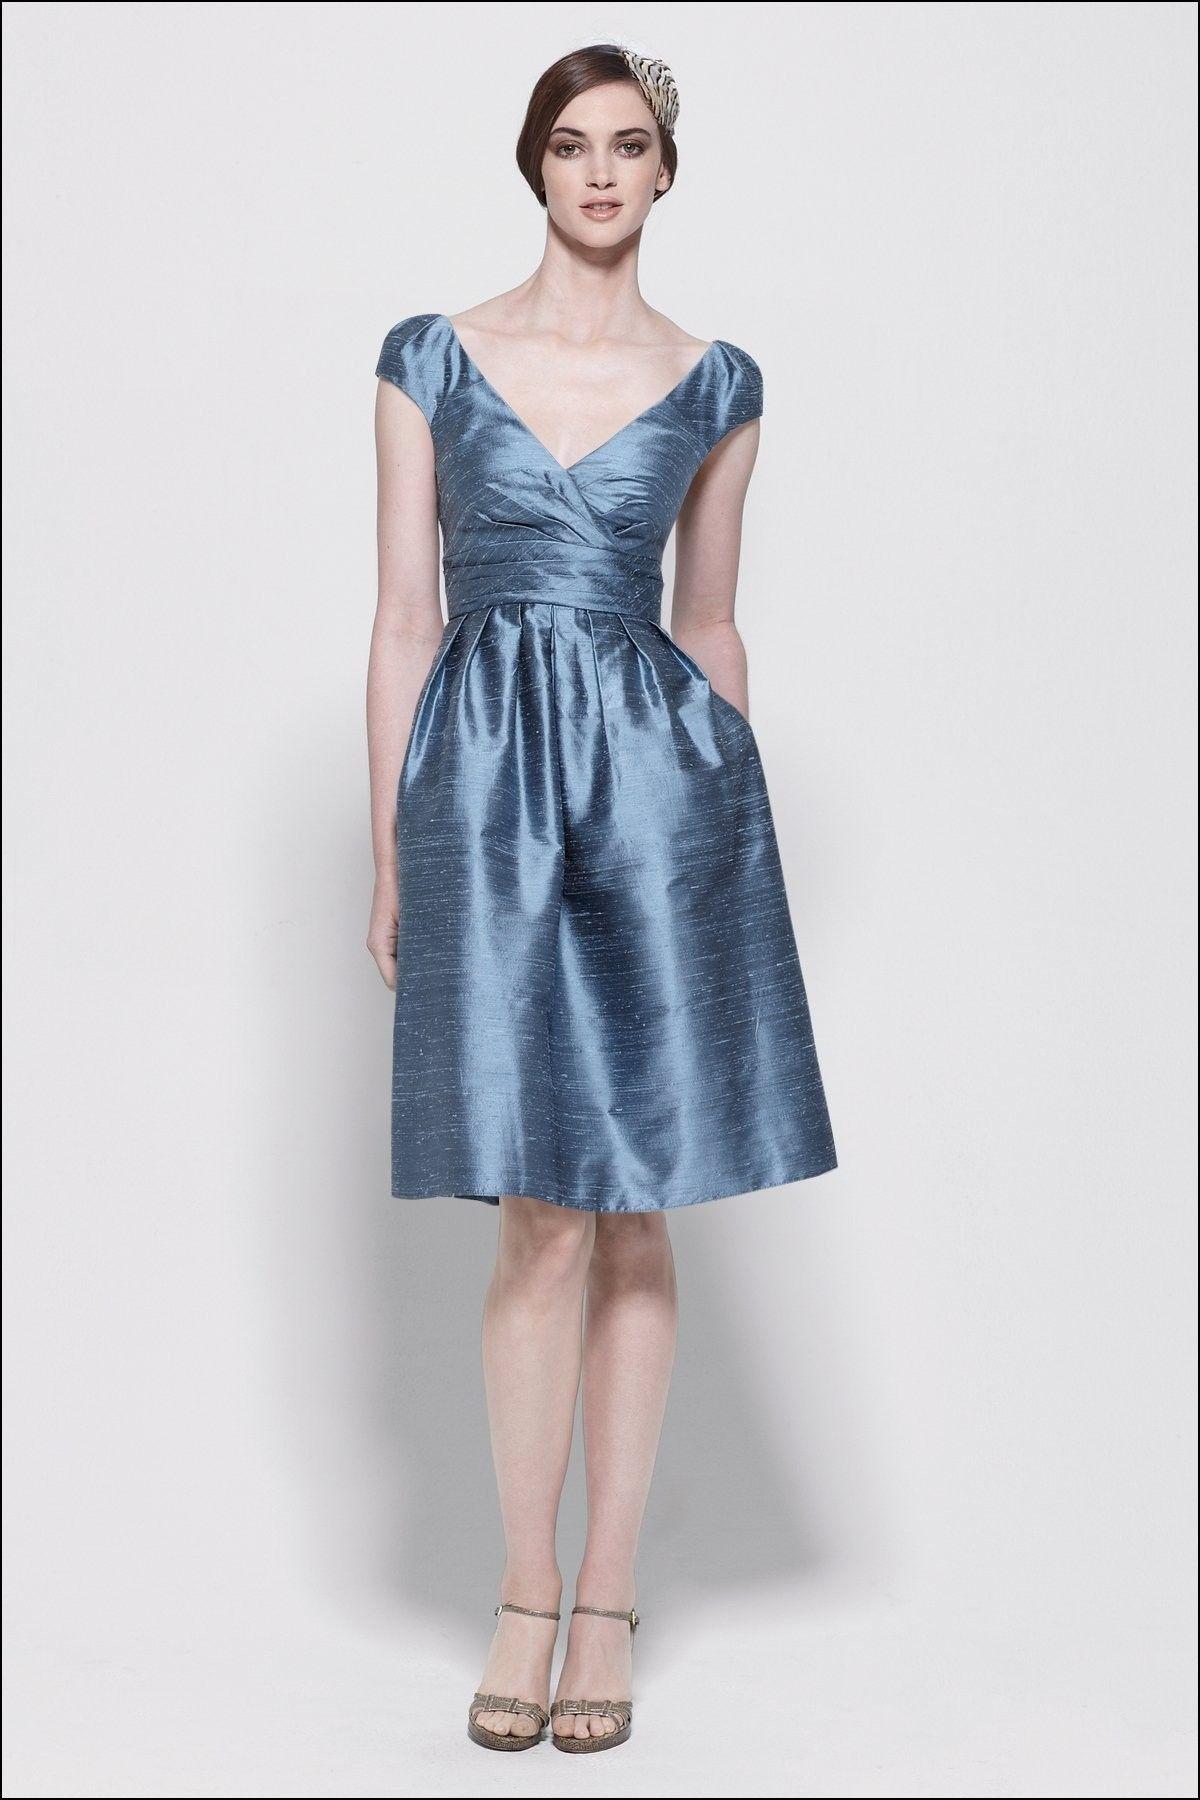 Old Fashioned Silk Bridesmaid Dress Image - All Wedding Dresses ...